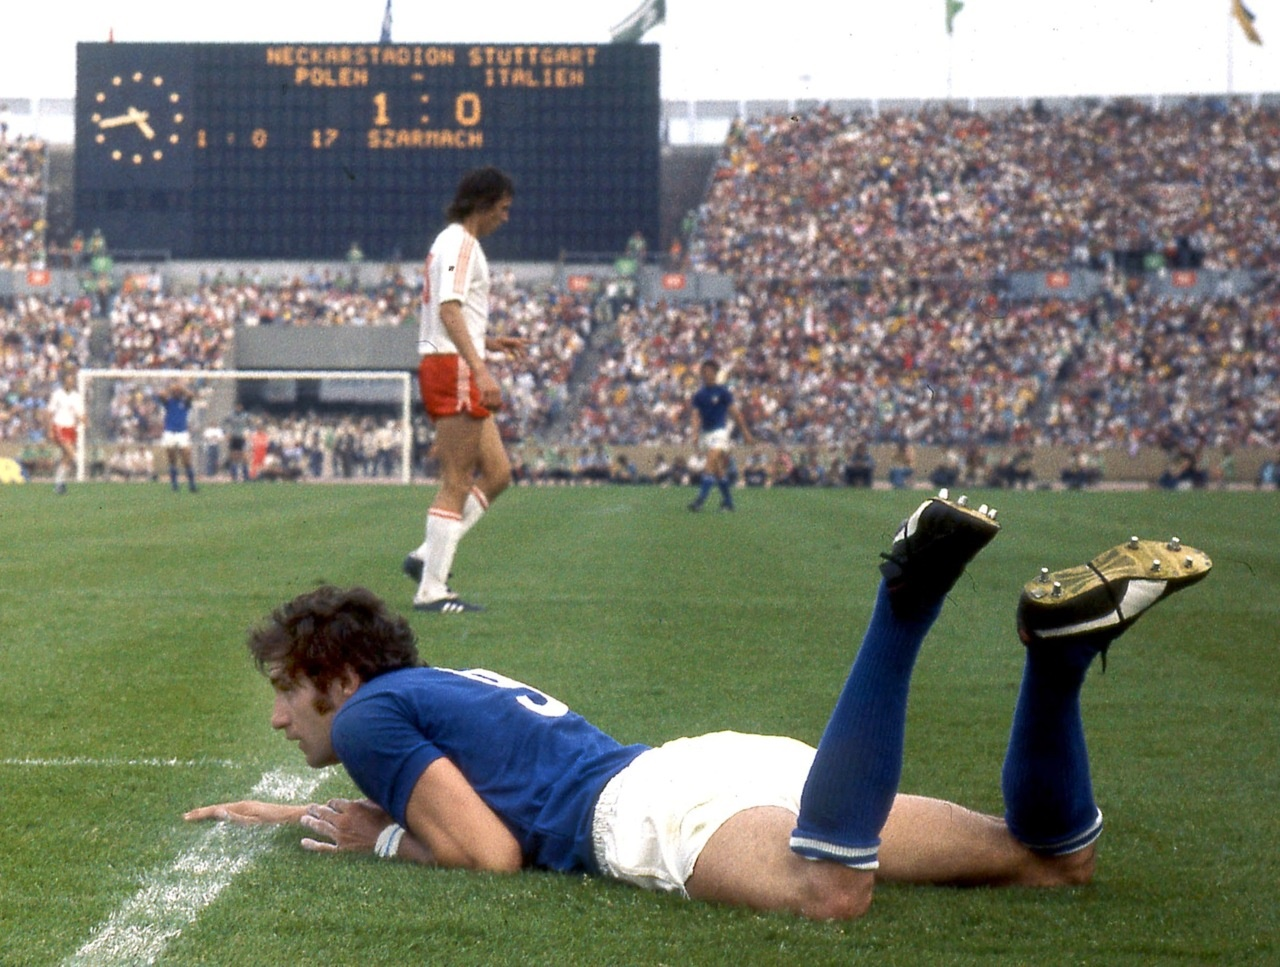 wchd-1974-polonia-italia-chinaglia